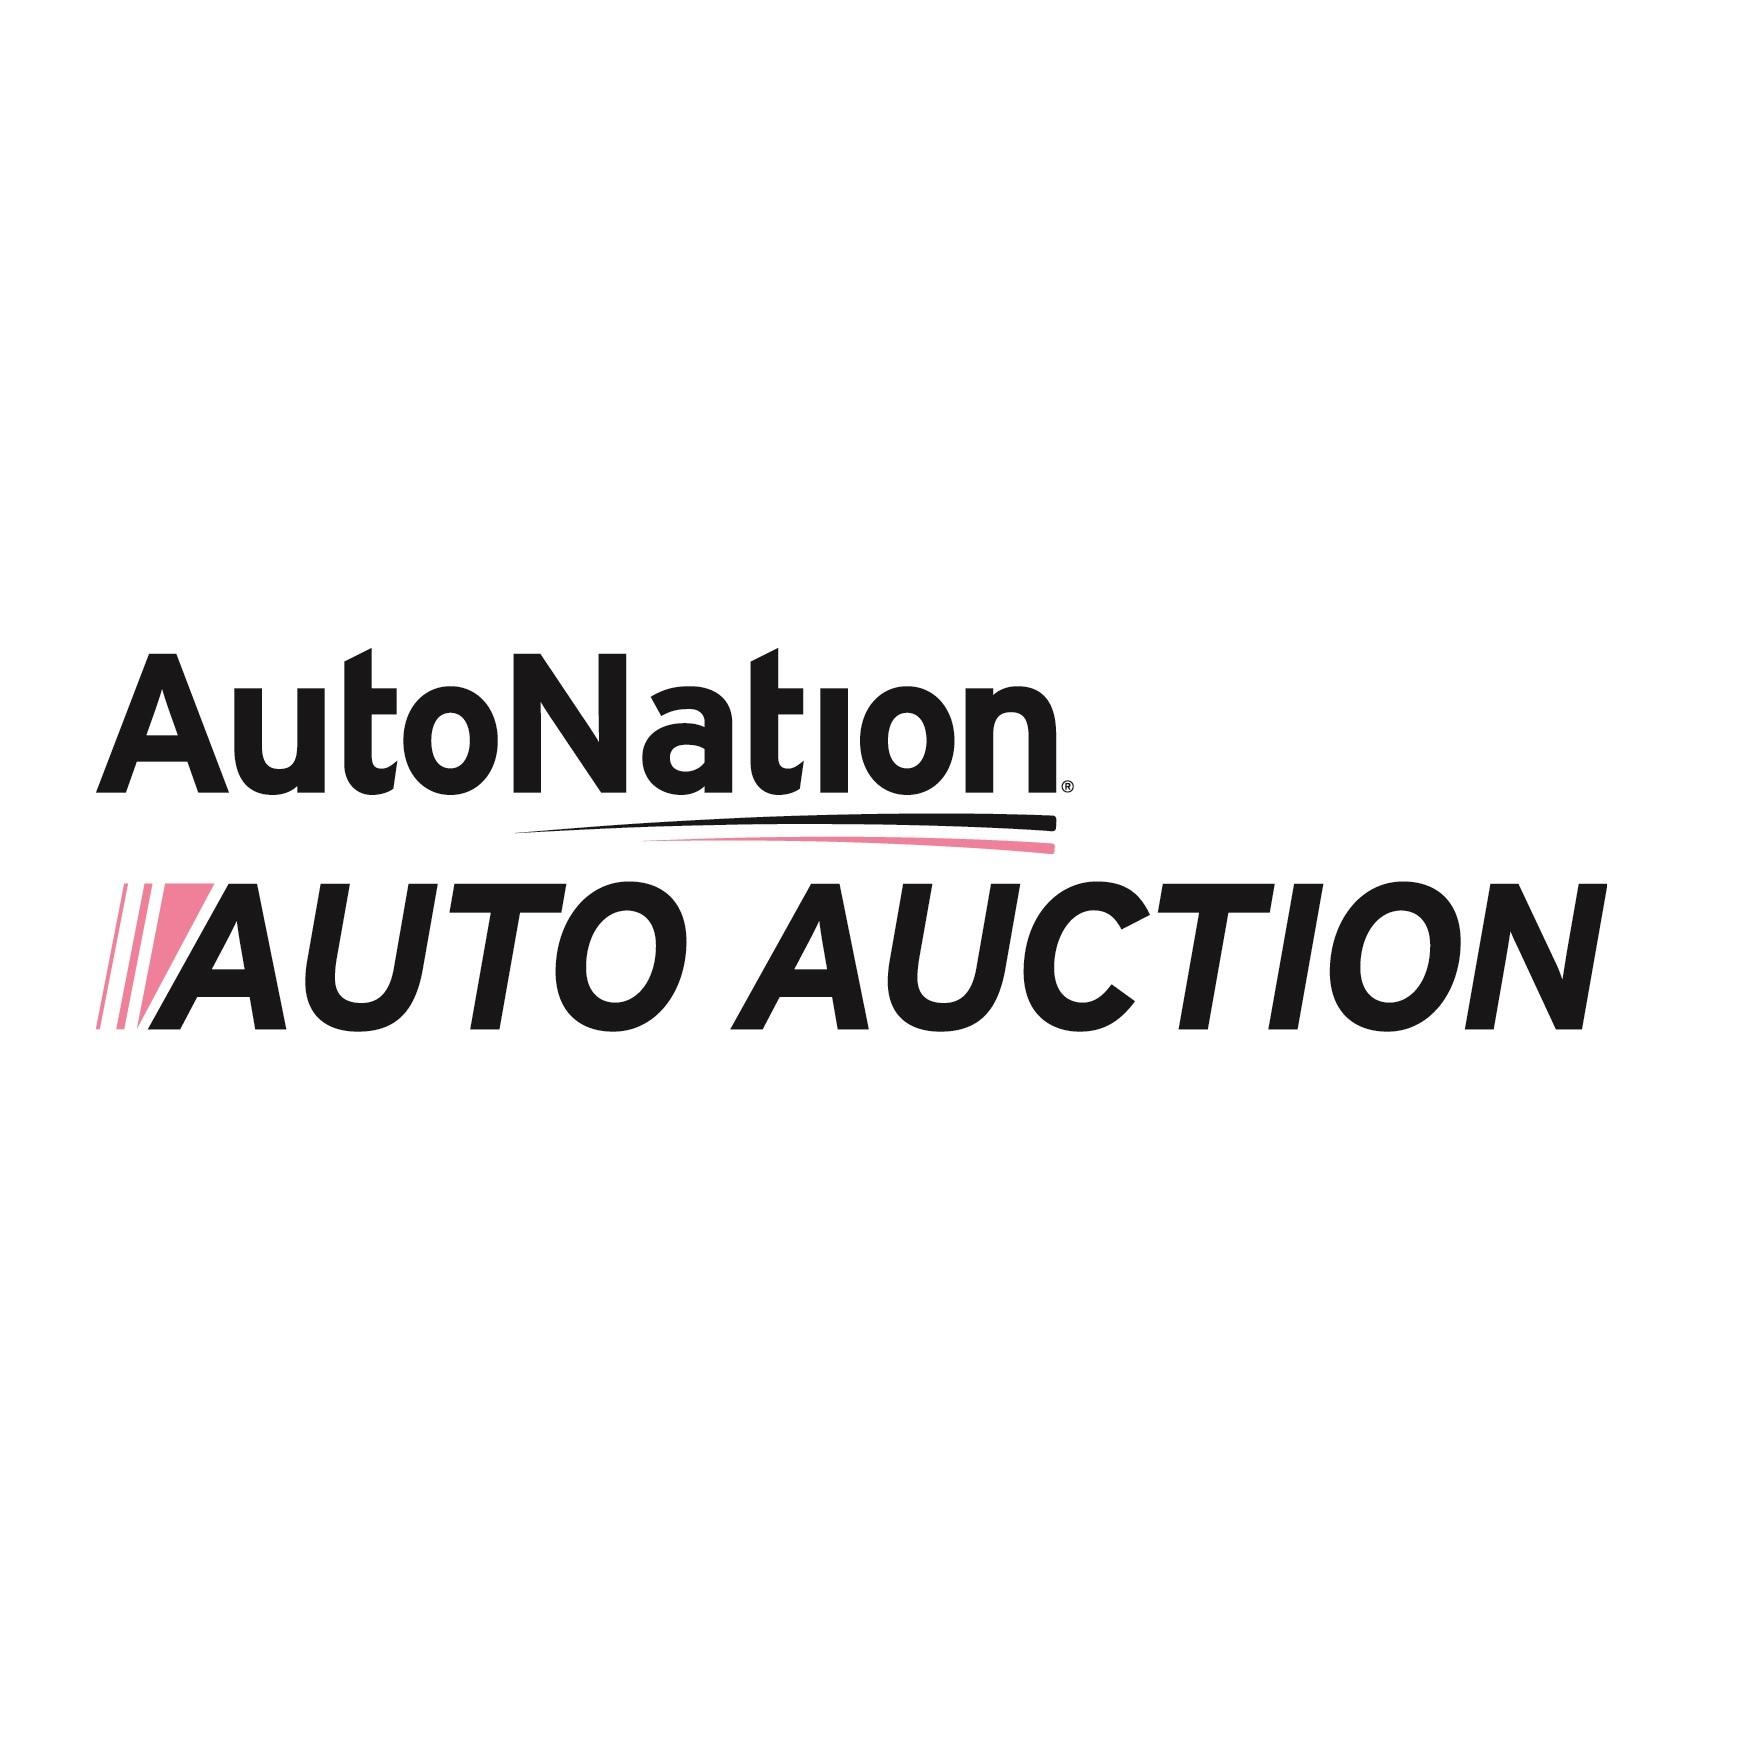 autonation auto auction houston in houston tx 281 506 3. Black Bedroom Furniture Sets. Home Design Ideas